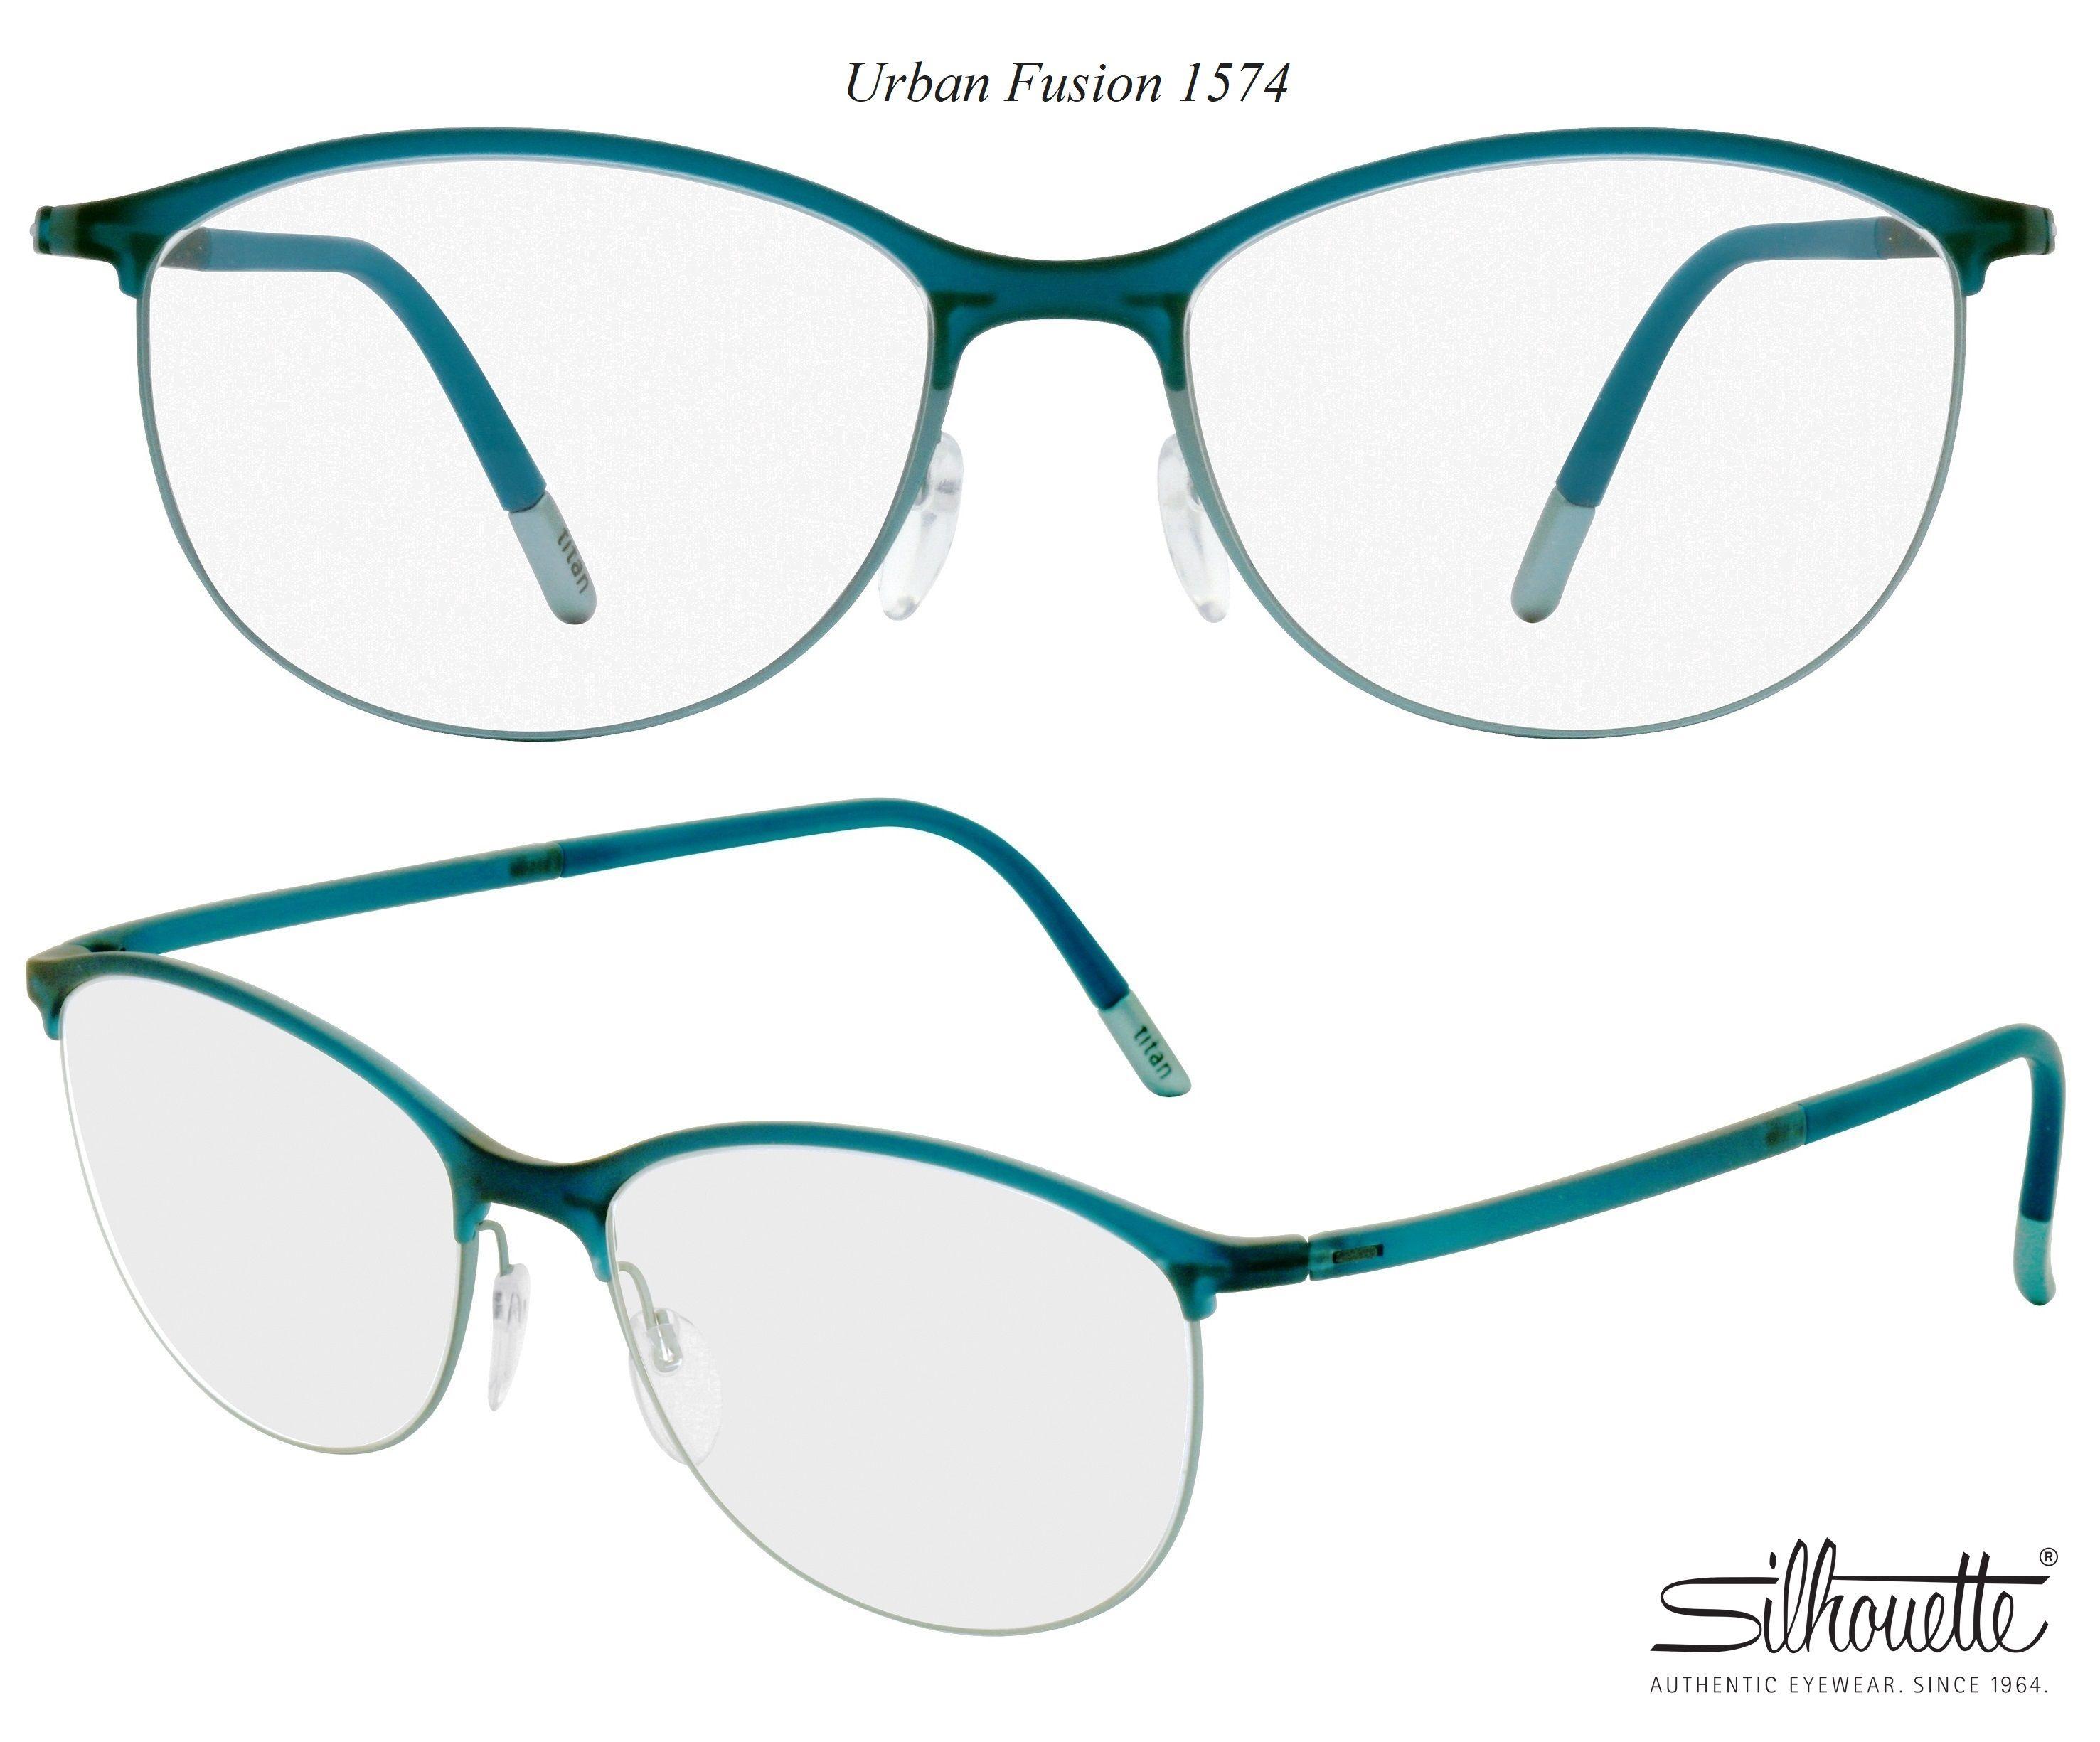 a480f99d7d8d Silhouette Urban Fusion Fullrim 1574 40-6060/Teal Eyeglasses Fashion Eyewear  Women's/Unisex SPX+ Titanium #Silhouette #UrbanFusion #SilhouetteEyewear ...